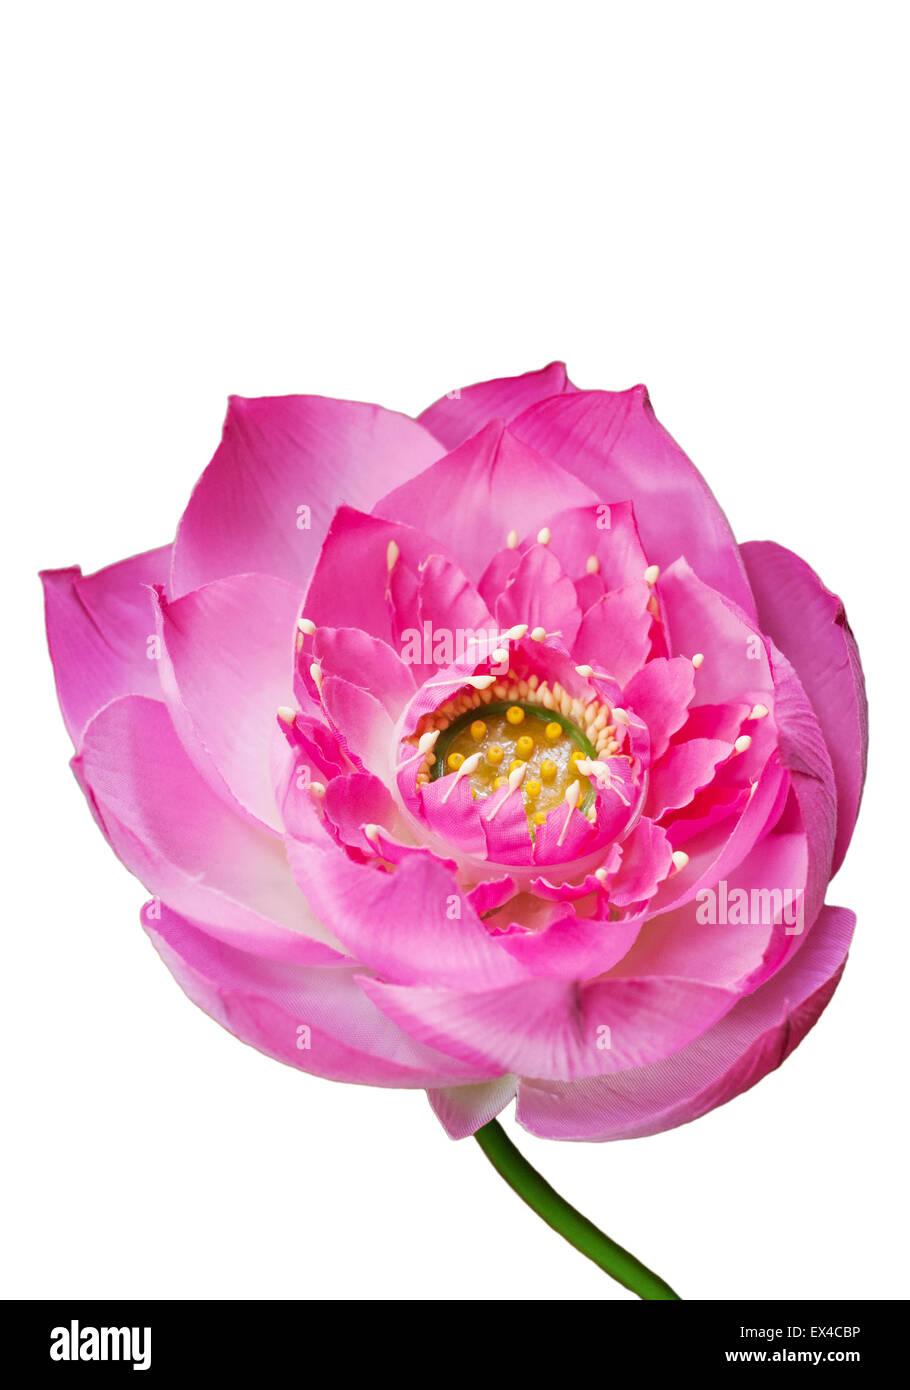 Artificial Lotus Flower Stock Photos Artificial Lotus Flower Stock